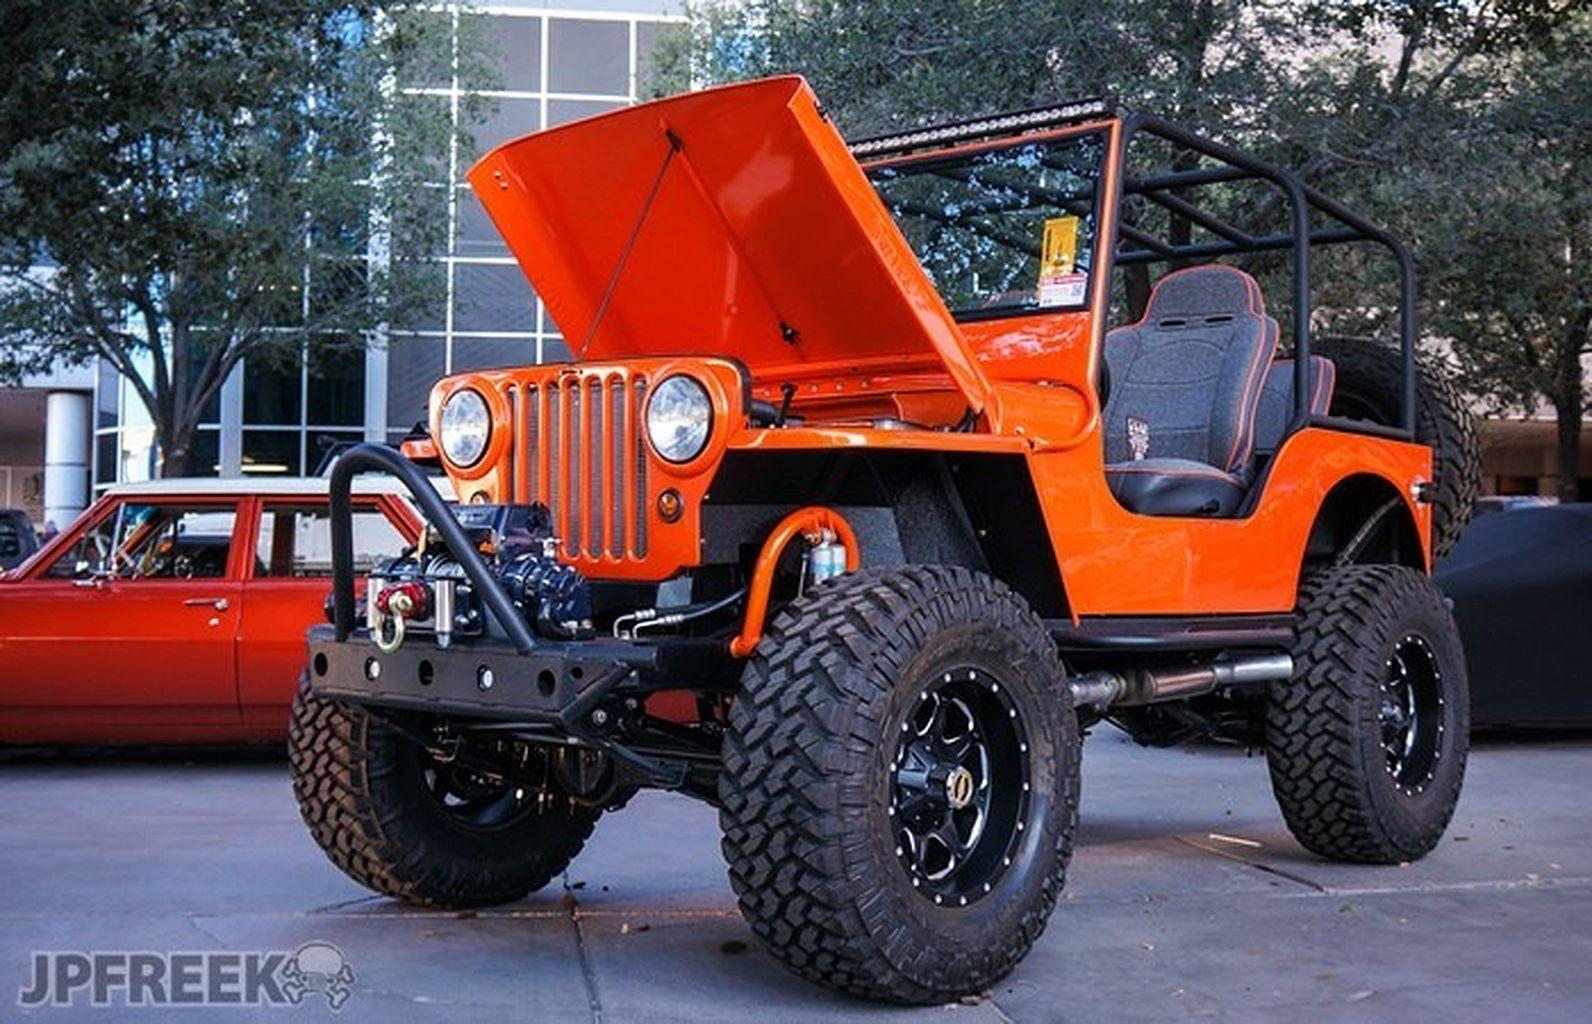 jeep wrangler outpost orange special ideas https www mobmasker com  [ 1592 x 1024 Pixel ]